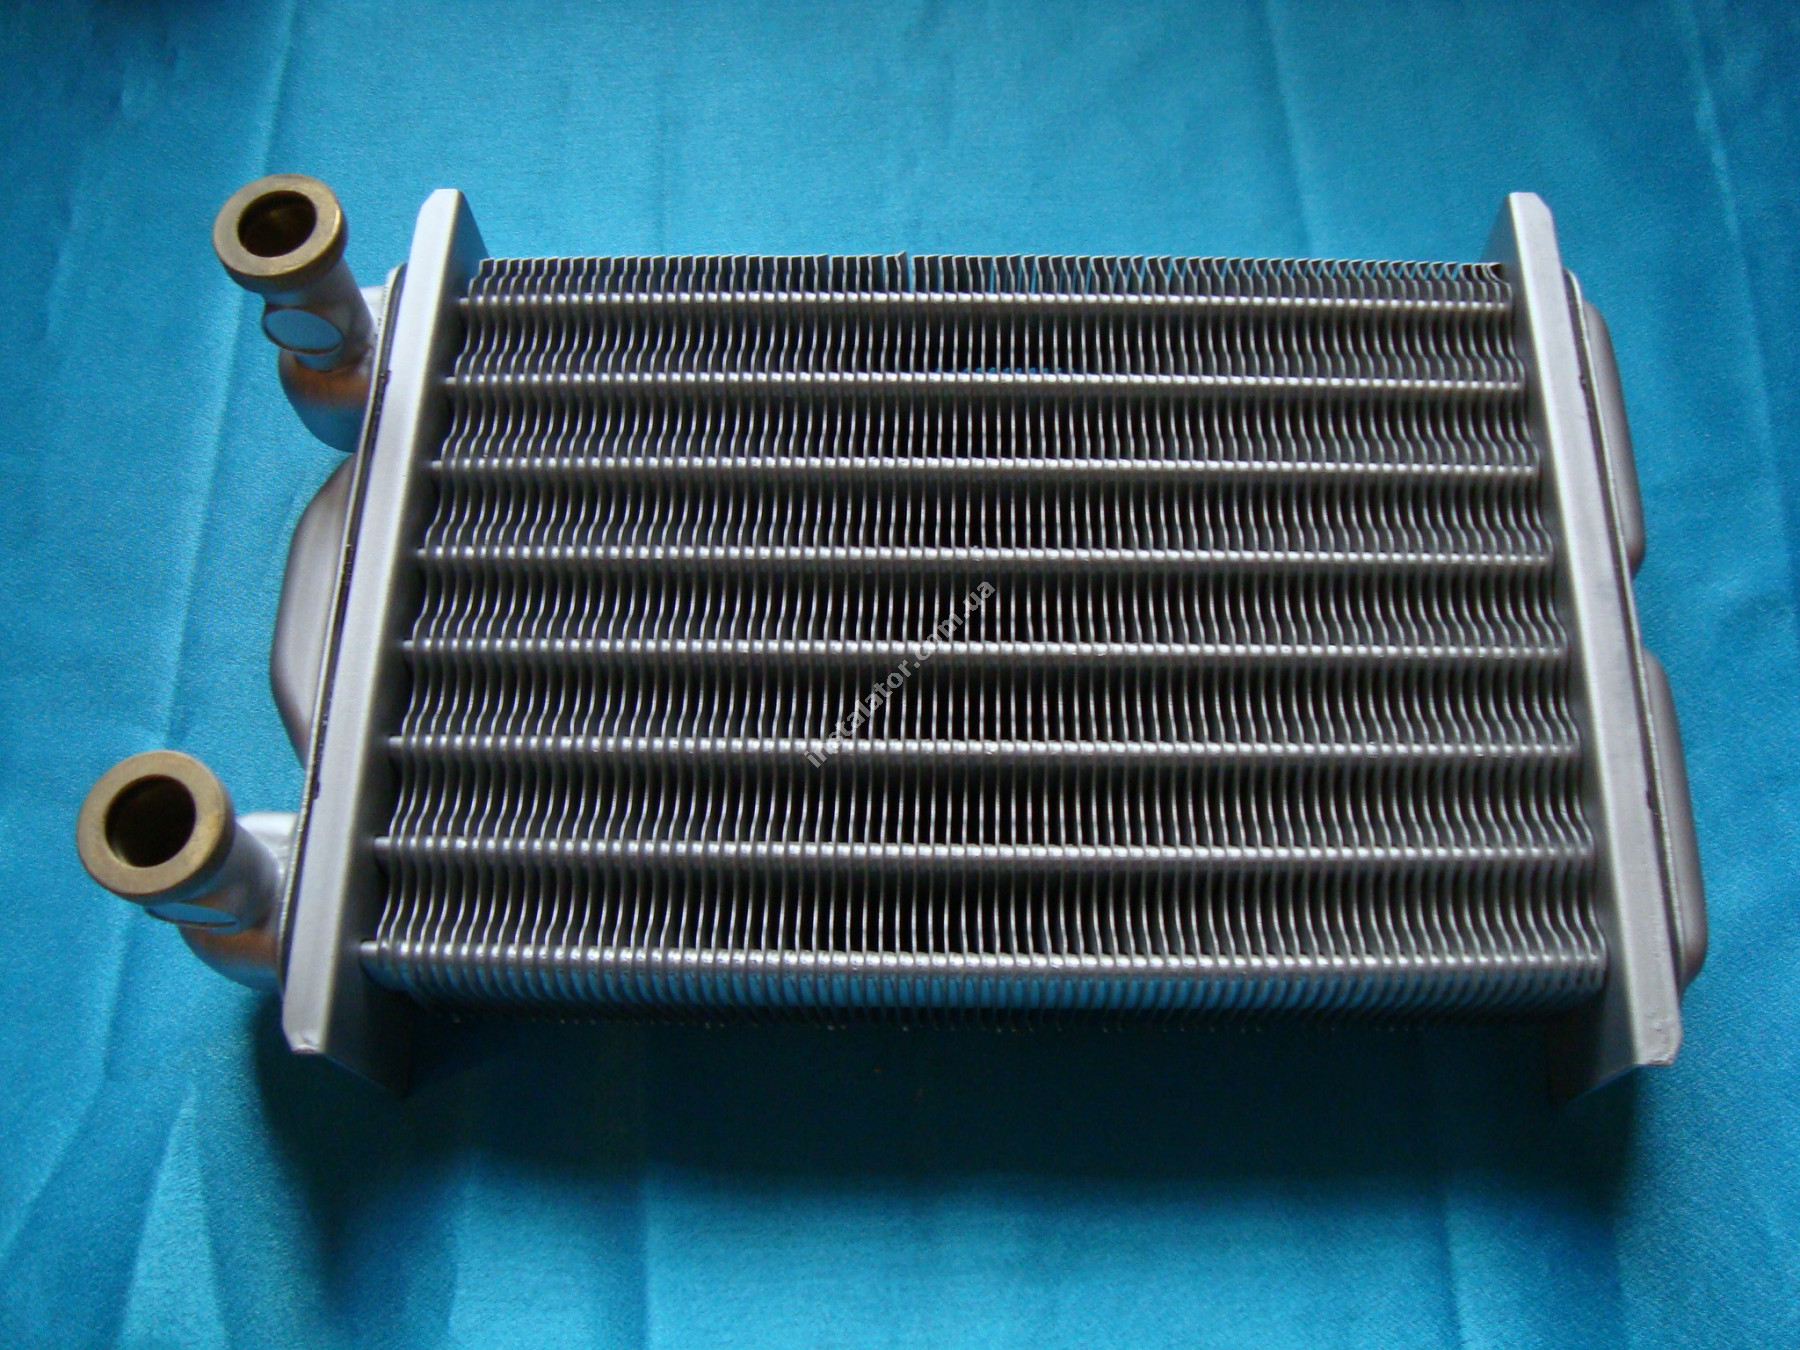 BI1202101 Теплообмінник первинний Biasi Nova Parva, Solar, Control full-image-2